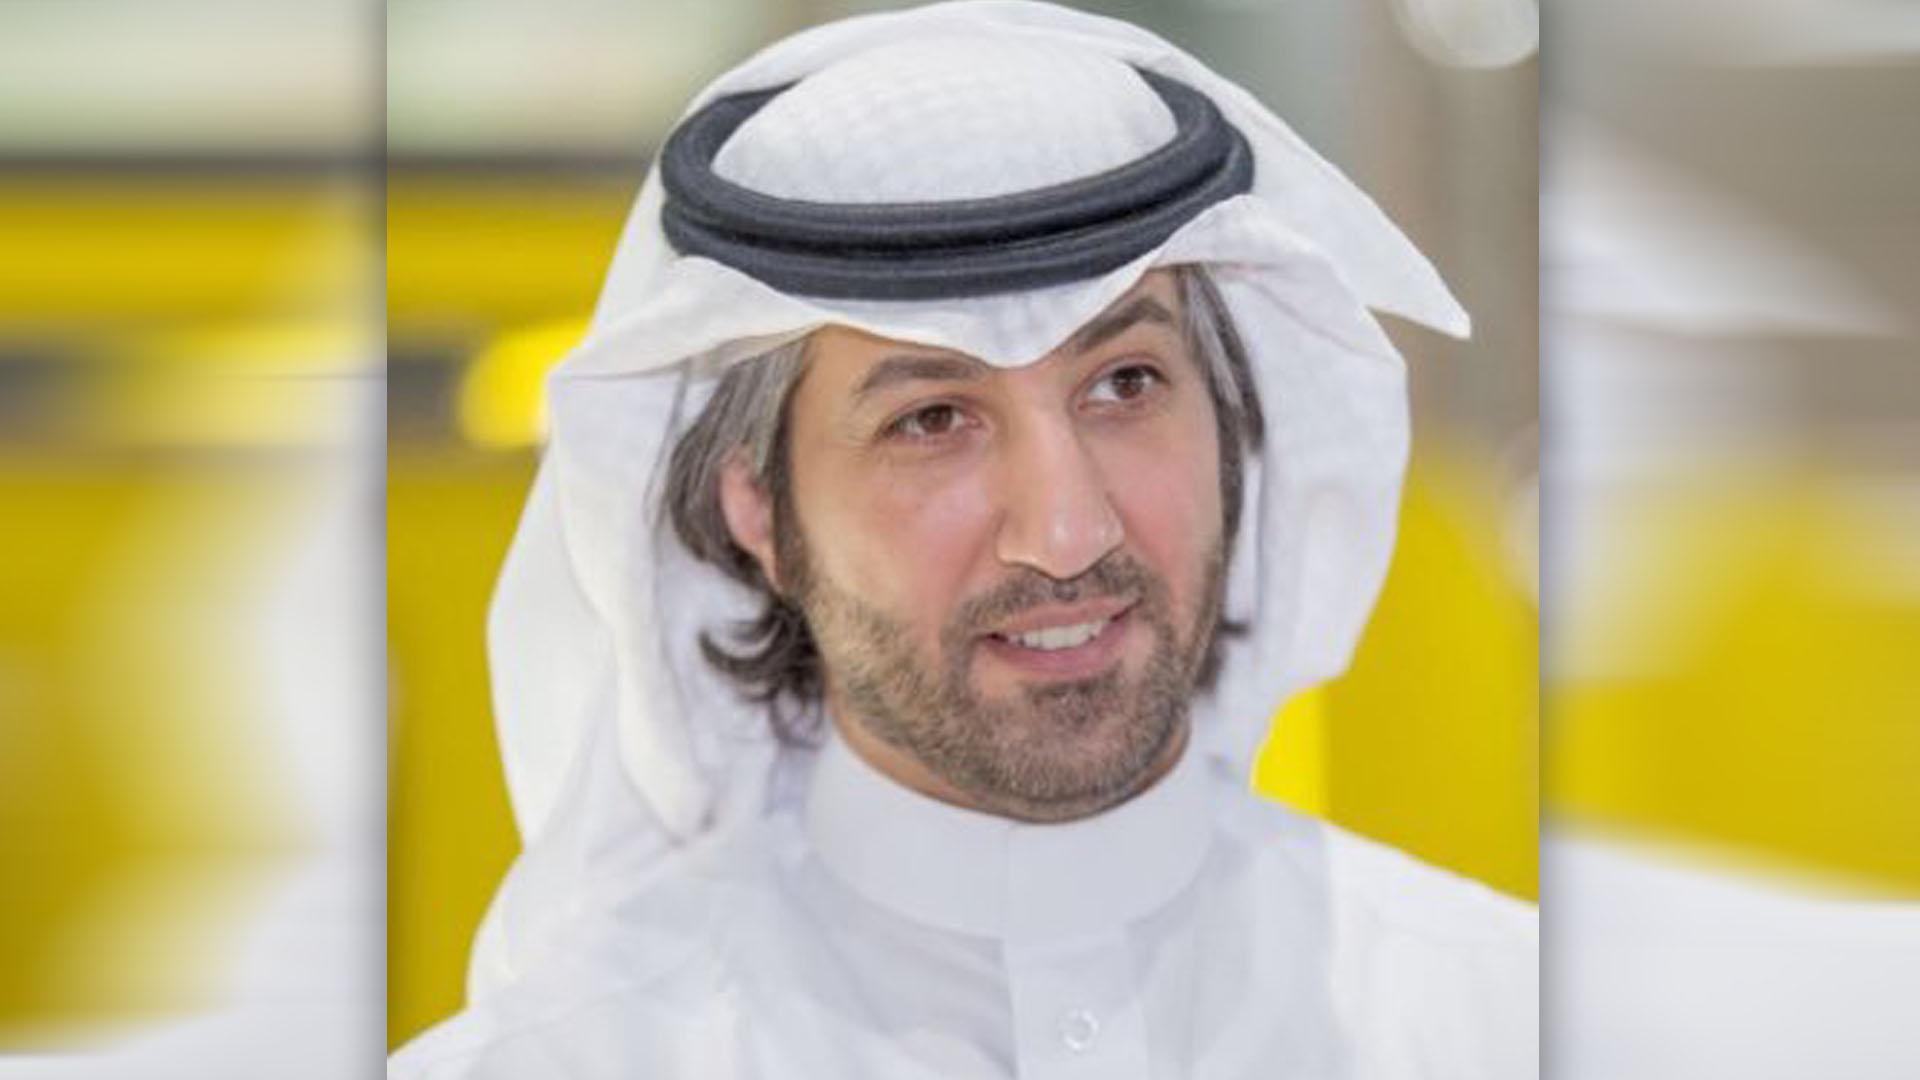 اعتقال شاعر سعودي مد اح لب ن سلمان لانتقاده إعلام الشتائم